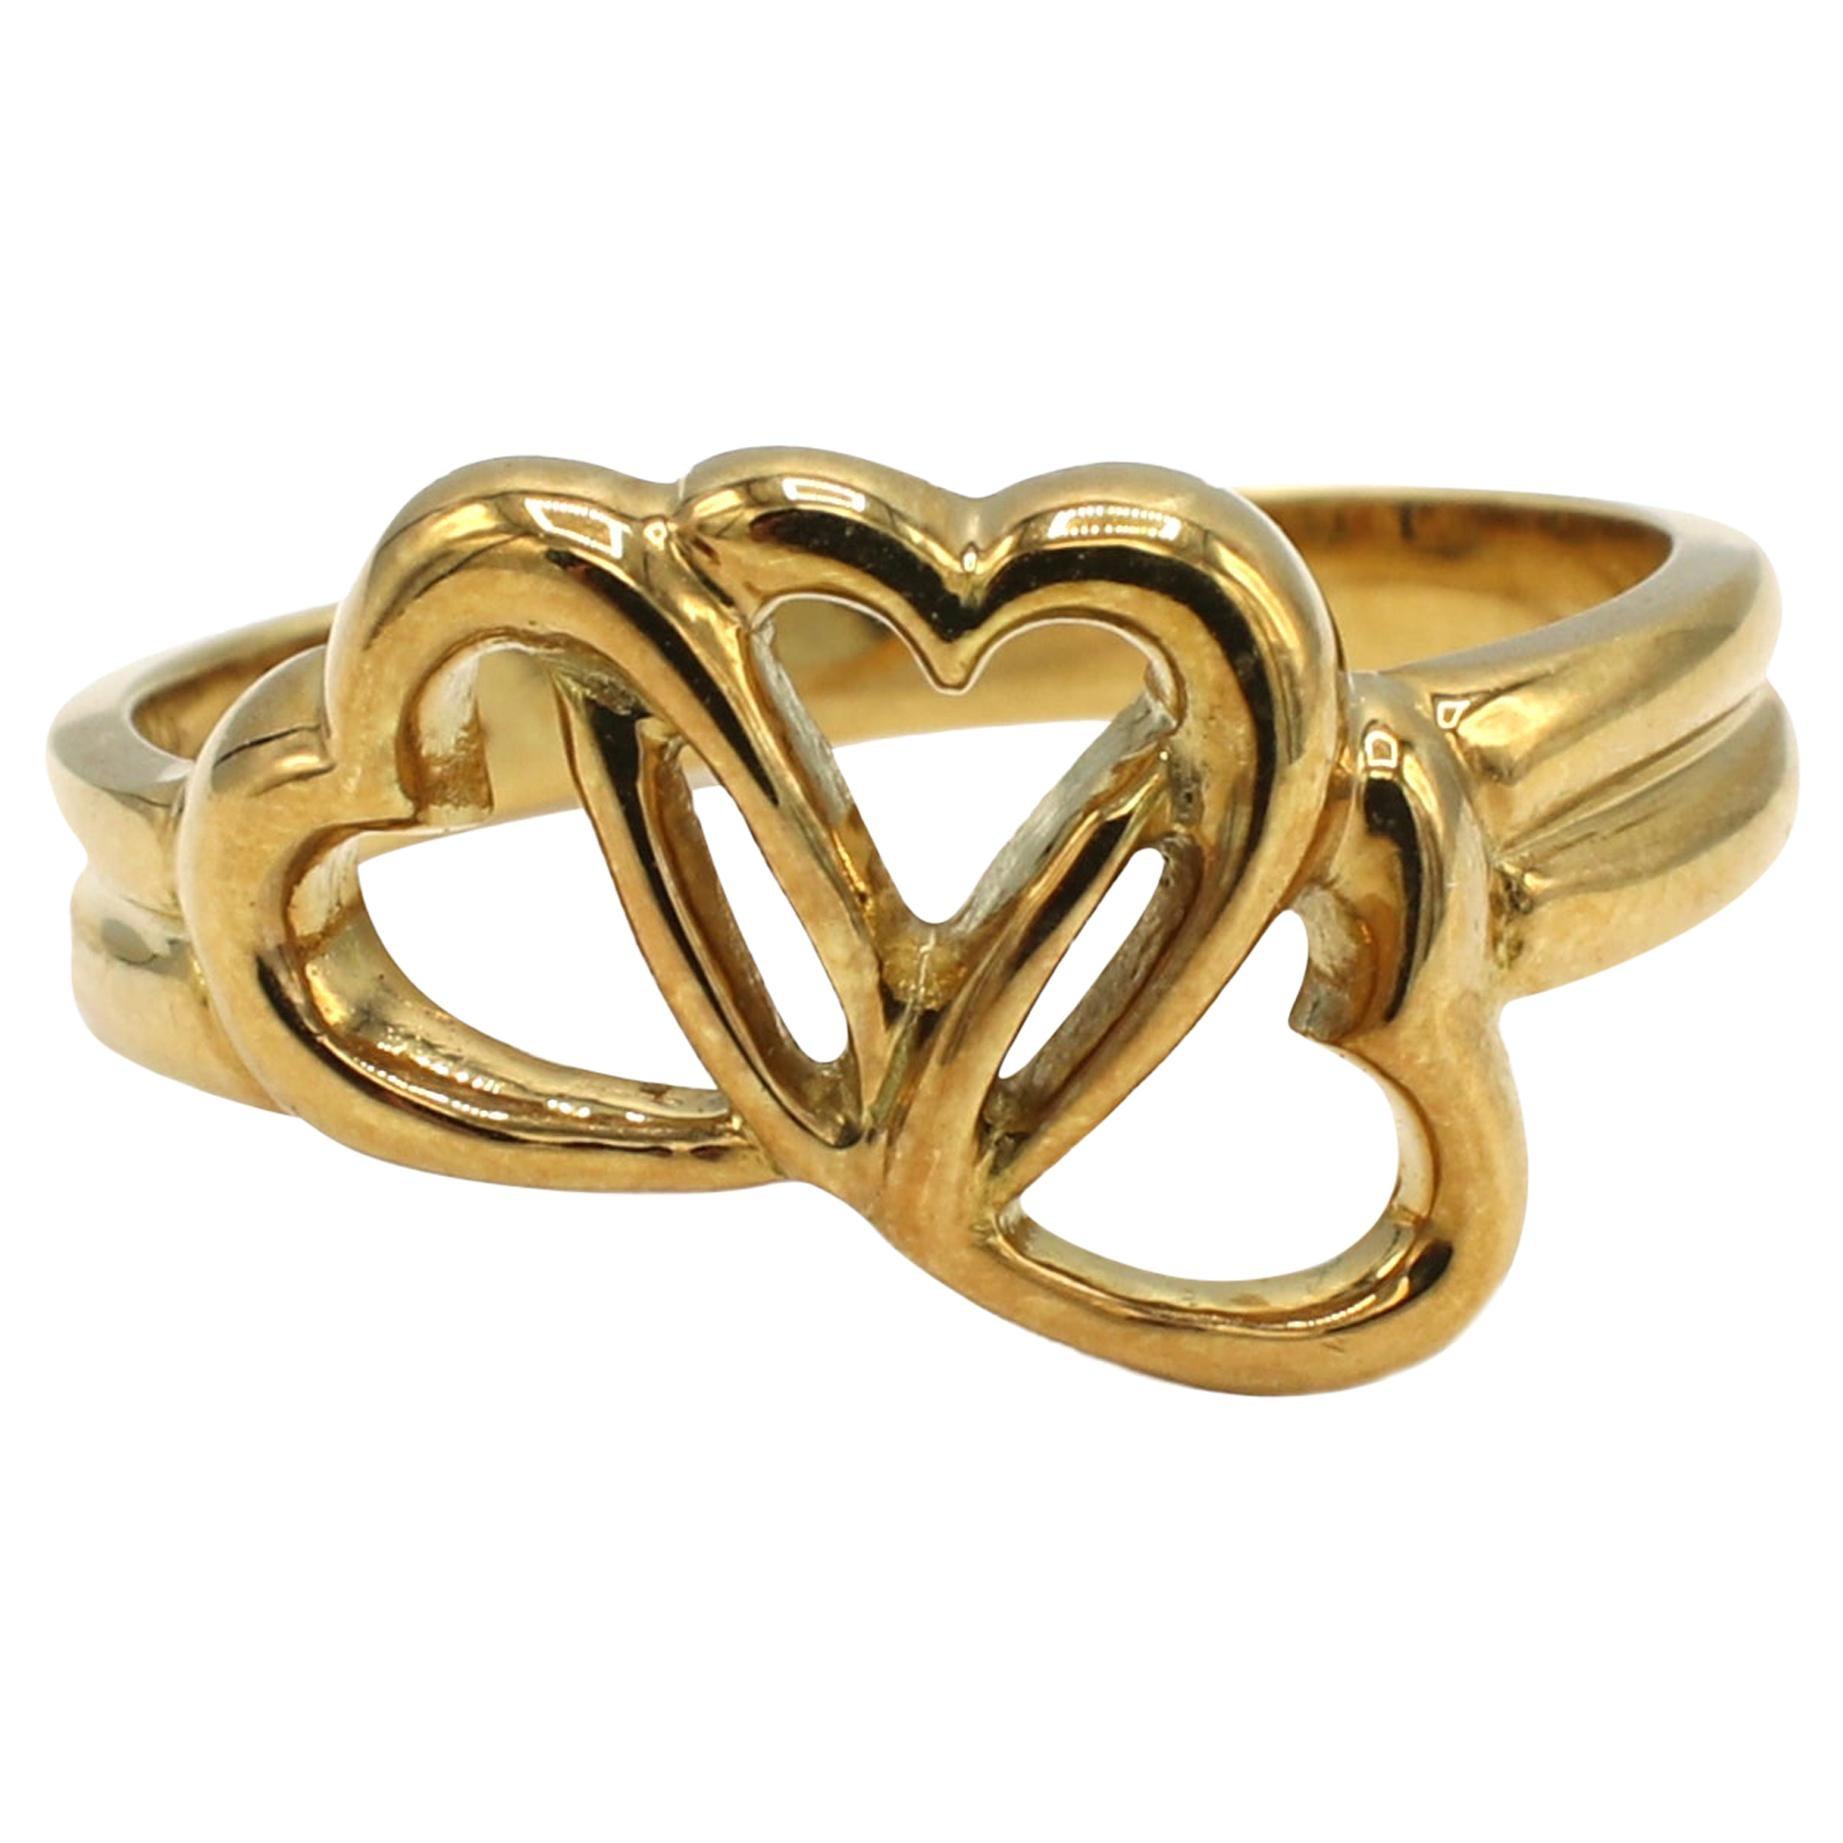 Tiffany & Co. 3 Open Heart 18 Karat Yellow Gold Ring